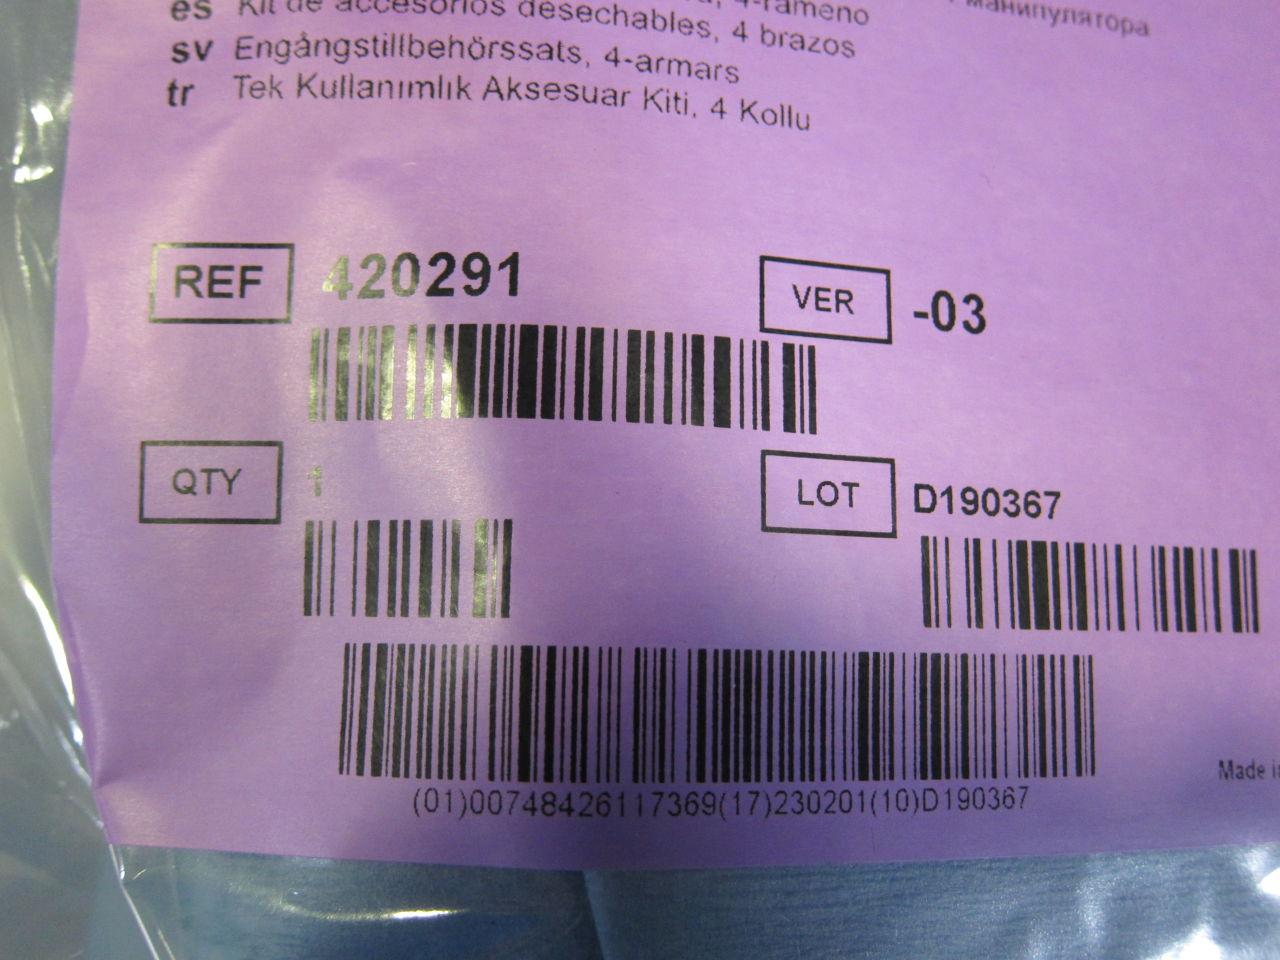 INTUITIVE SURGICAL DA VINCI 420291 Accessory Kit (Drapes, Cannula Seals) - Lot of 7